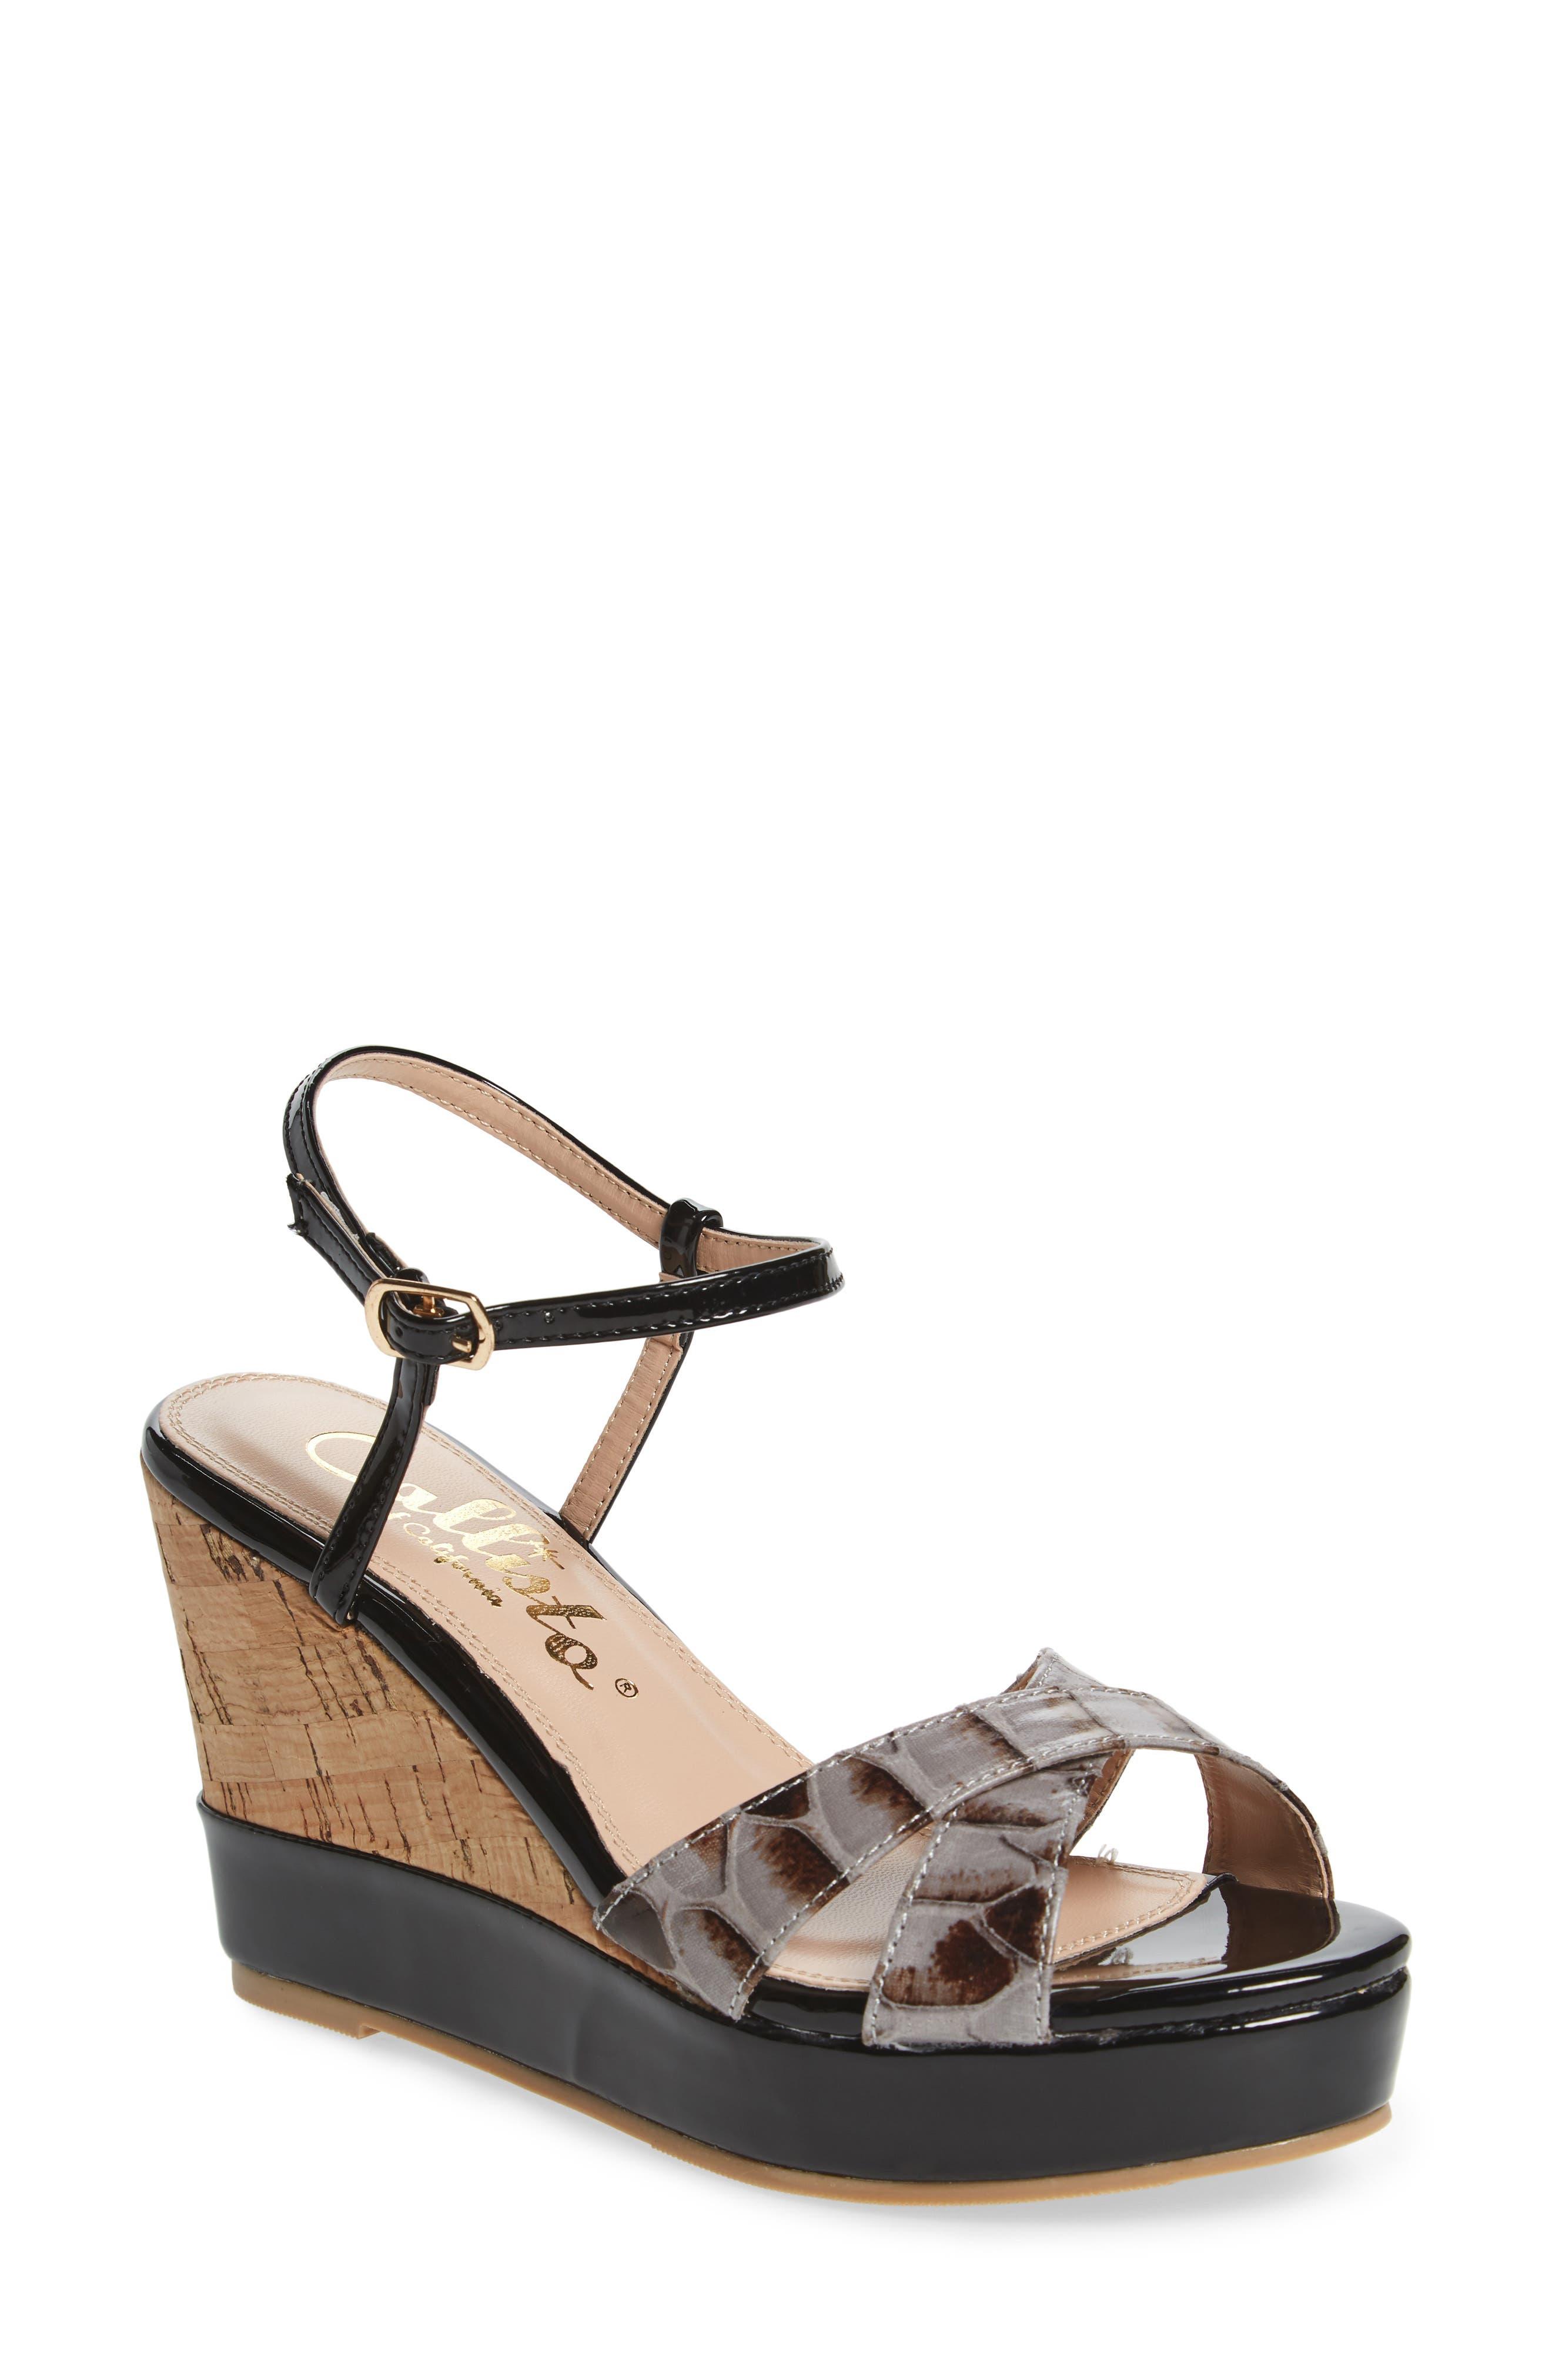 Main Image - Callisto Lottie Platform Wedge Sandal (Women)